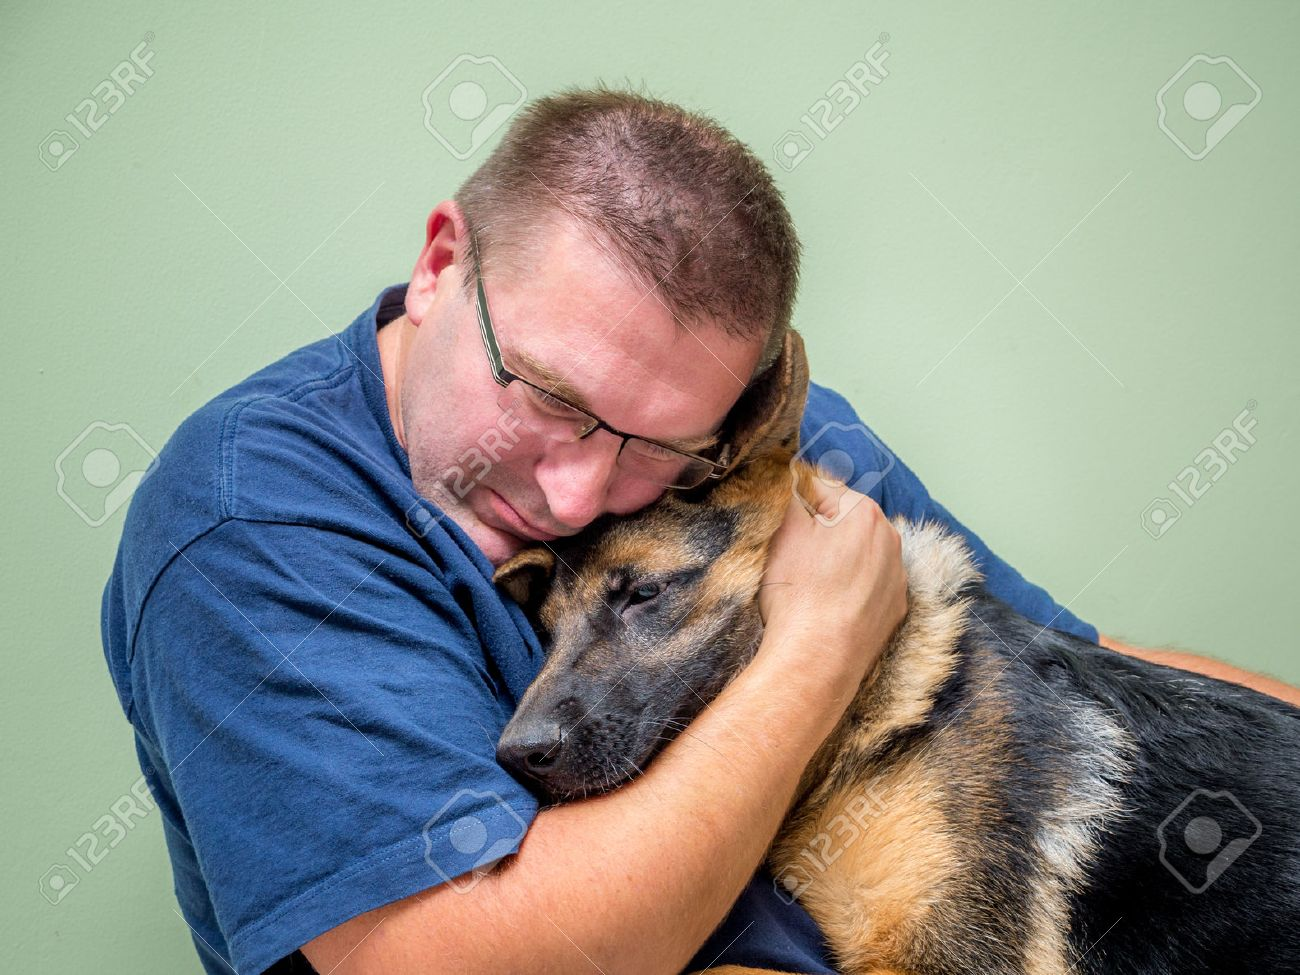 Young man hugging and consolating his dog Stock Photo - 31626641